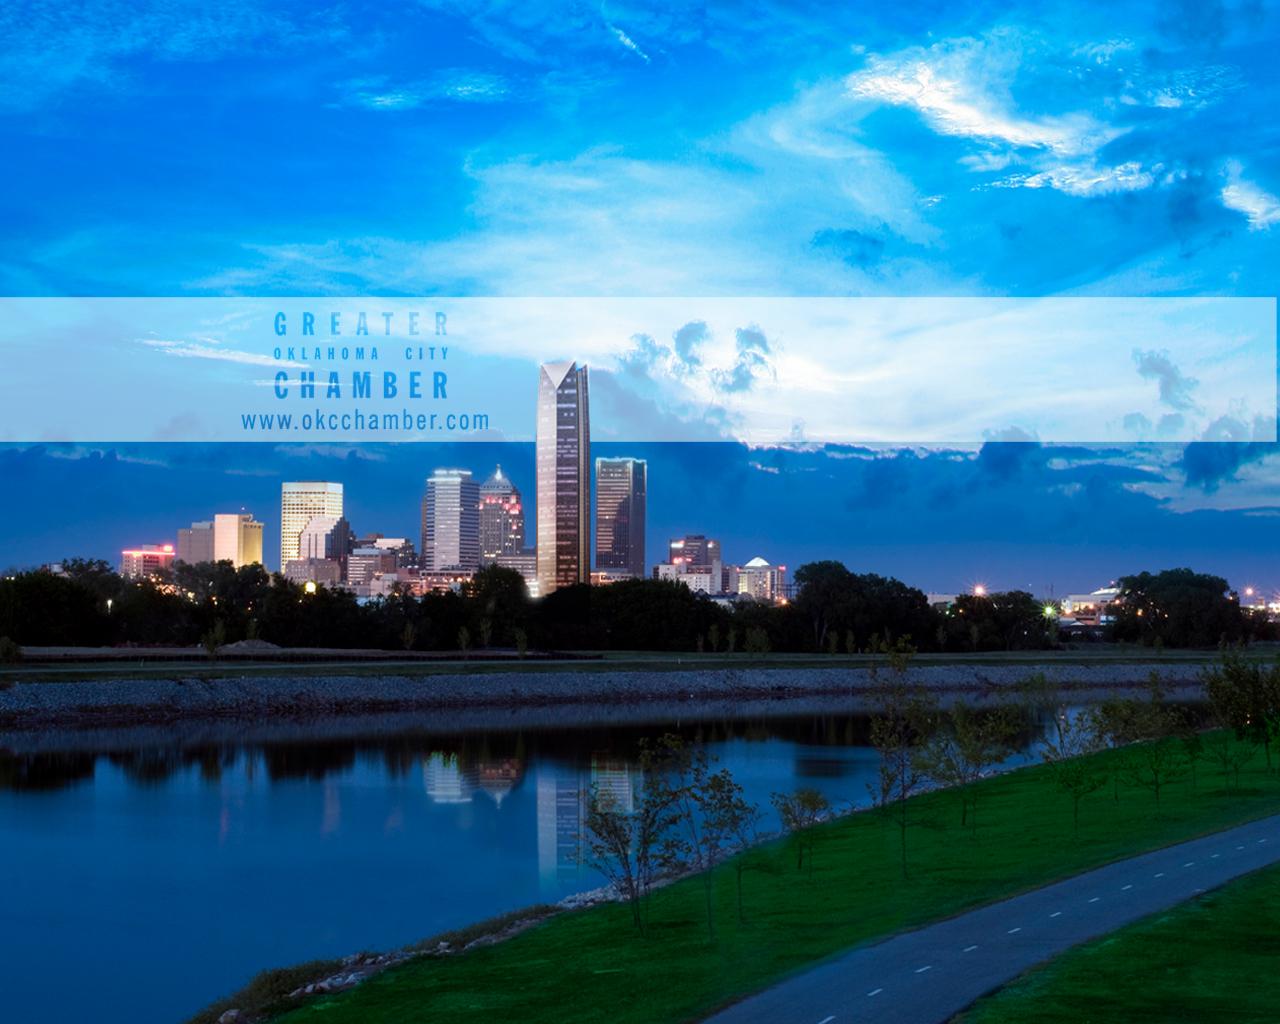 City Skyline Wallpaper Iphone Greater Oklahoma City Chamber Desktop Wallpaper